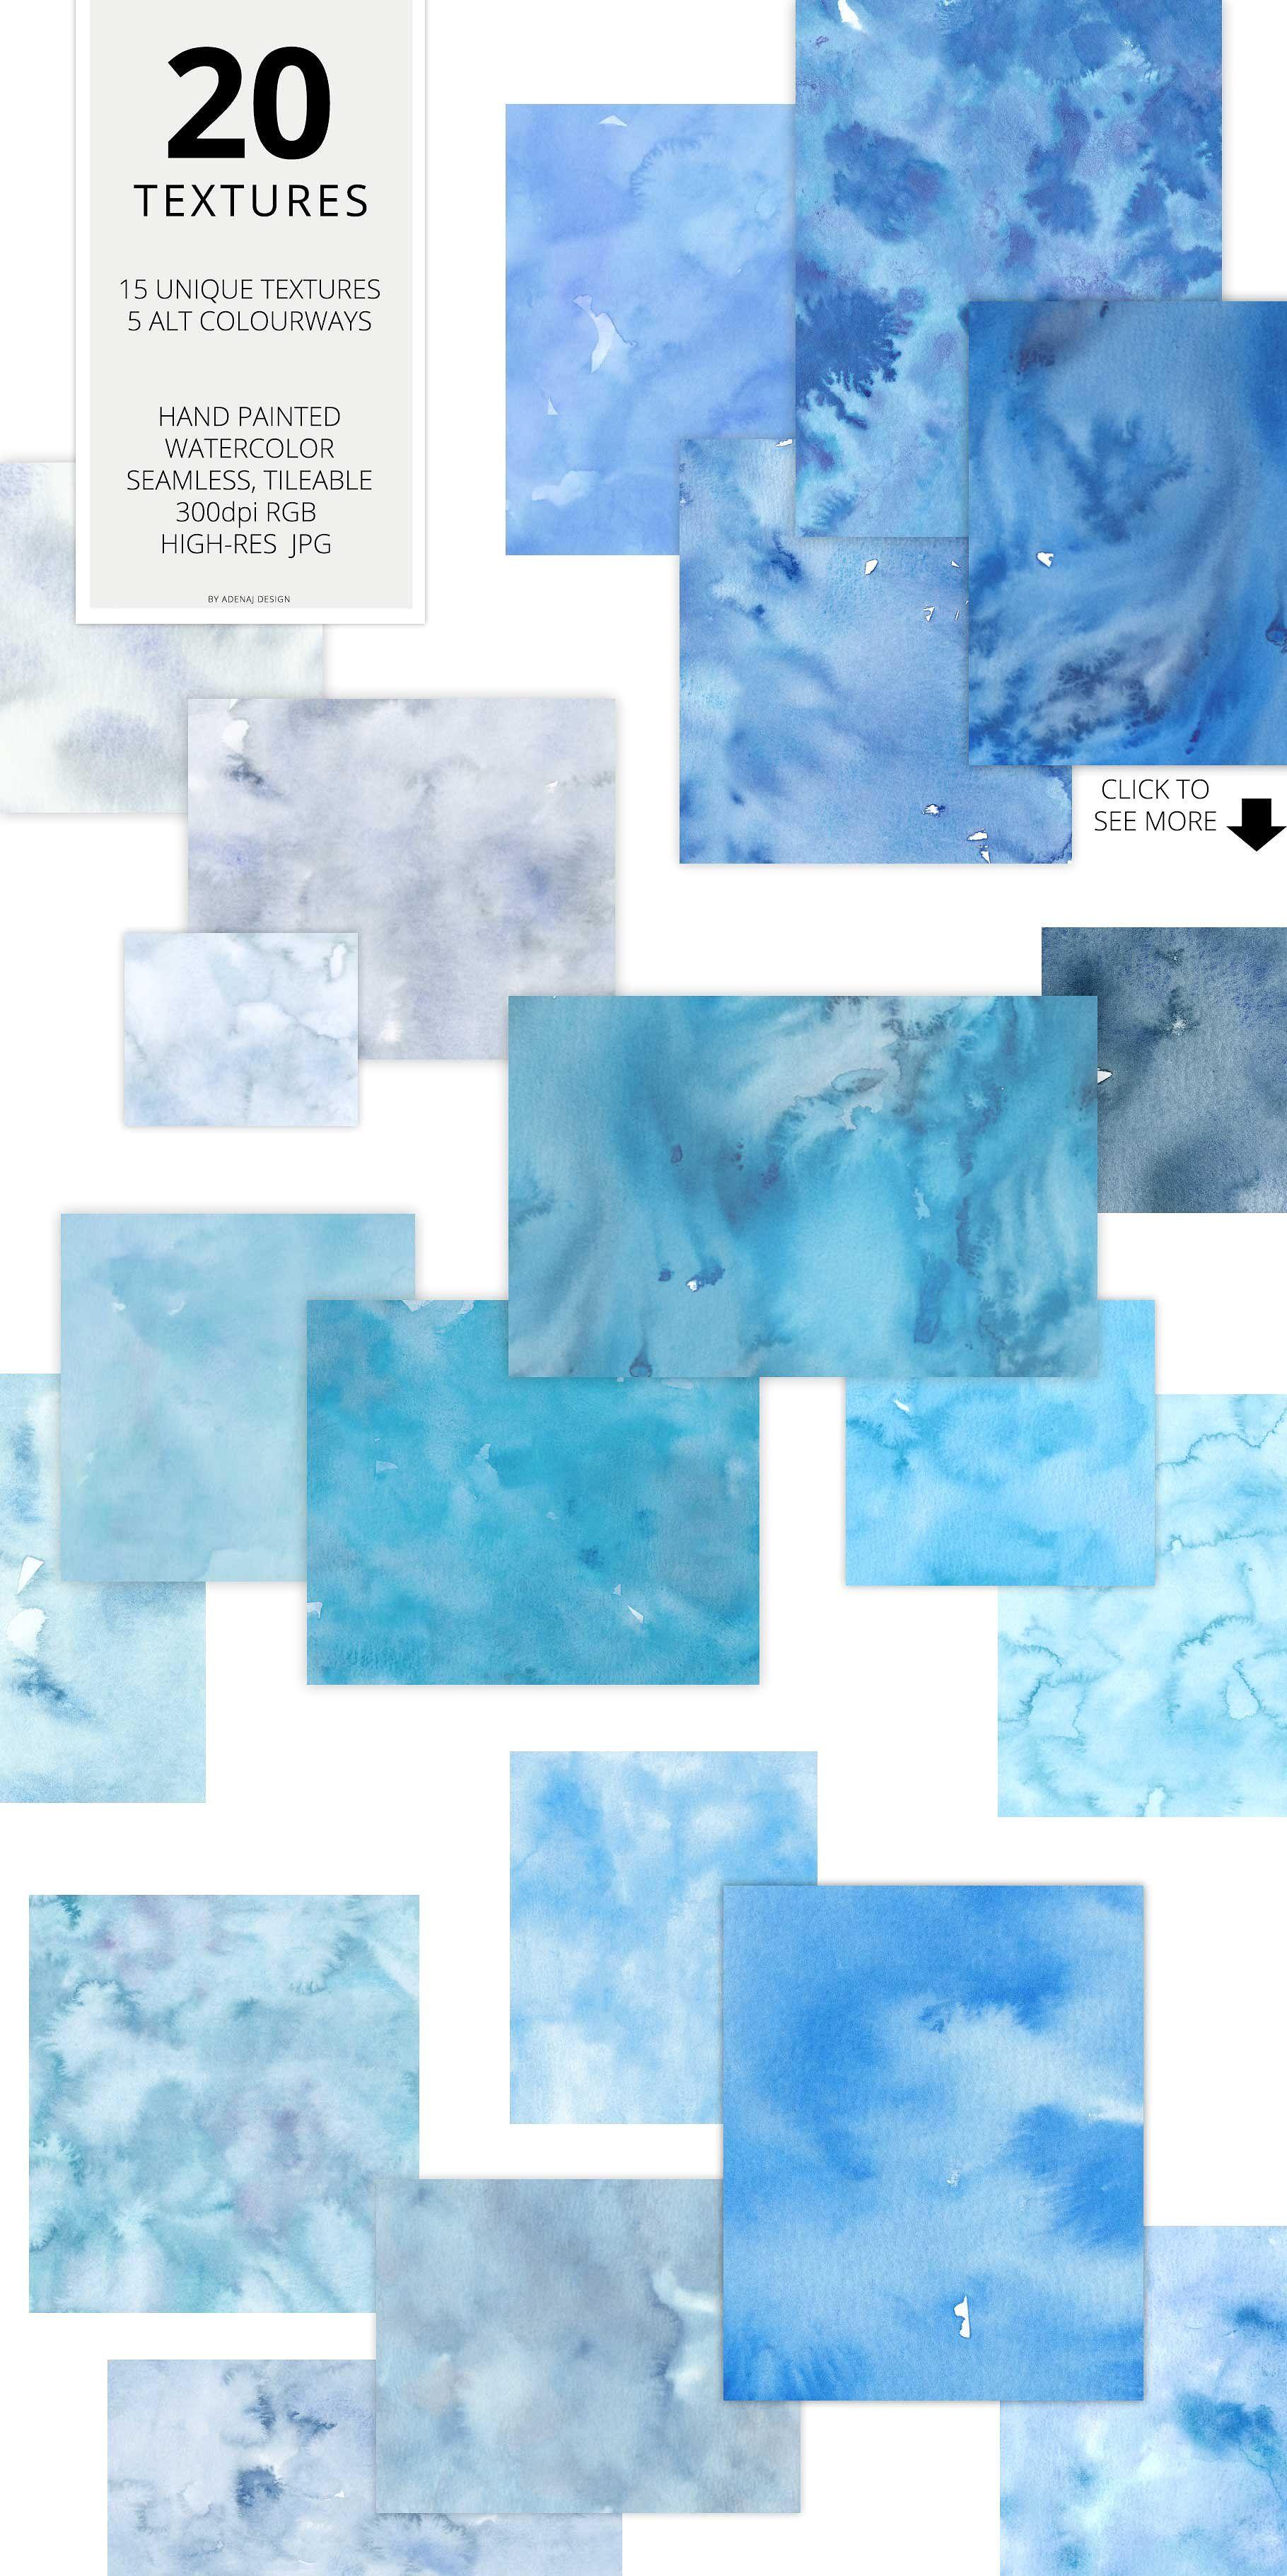 20 Huge Seamless Watercolor Textures By Adenaj On Creativemarket